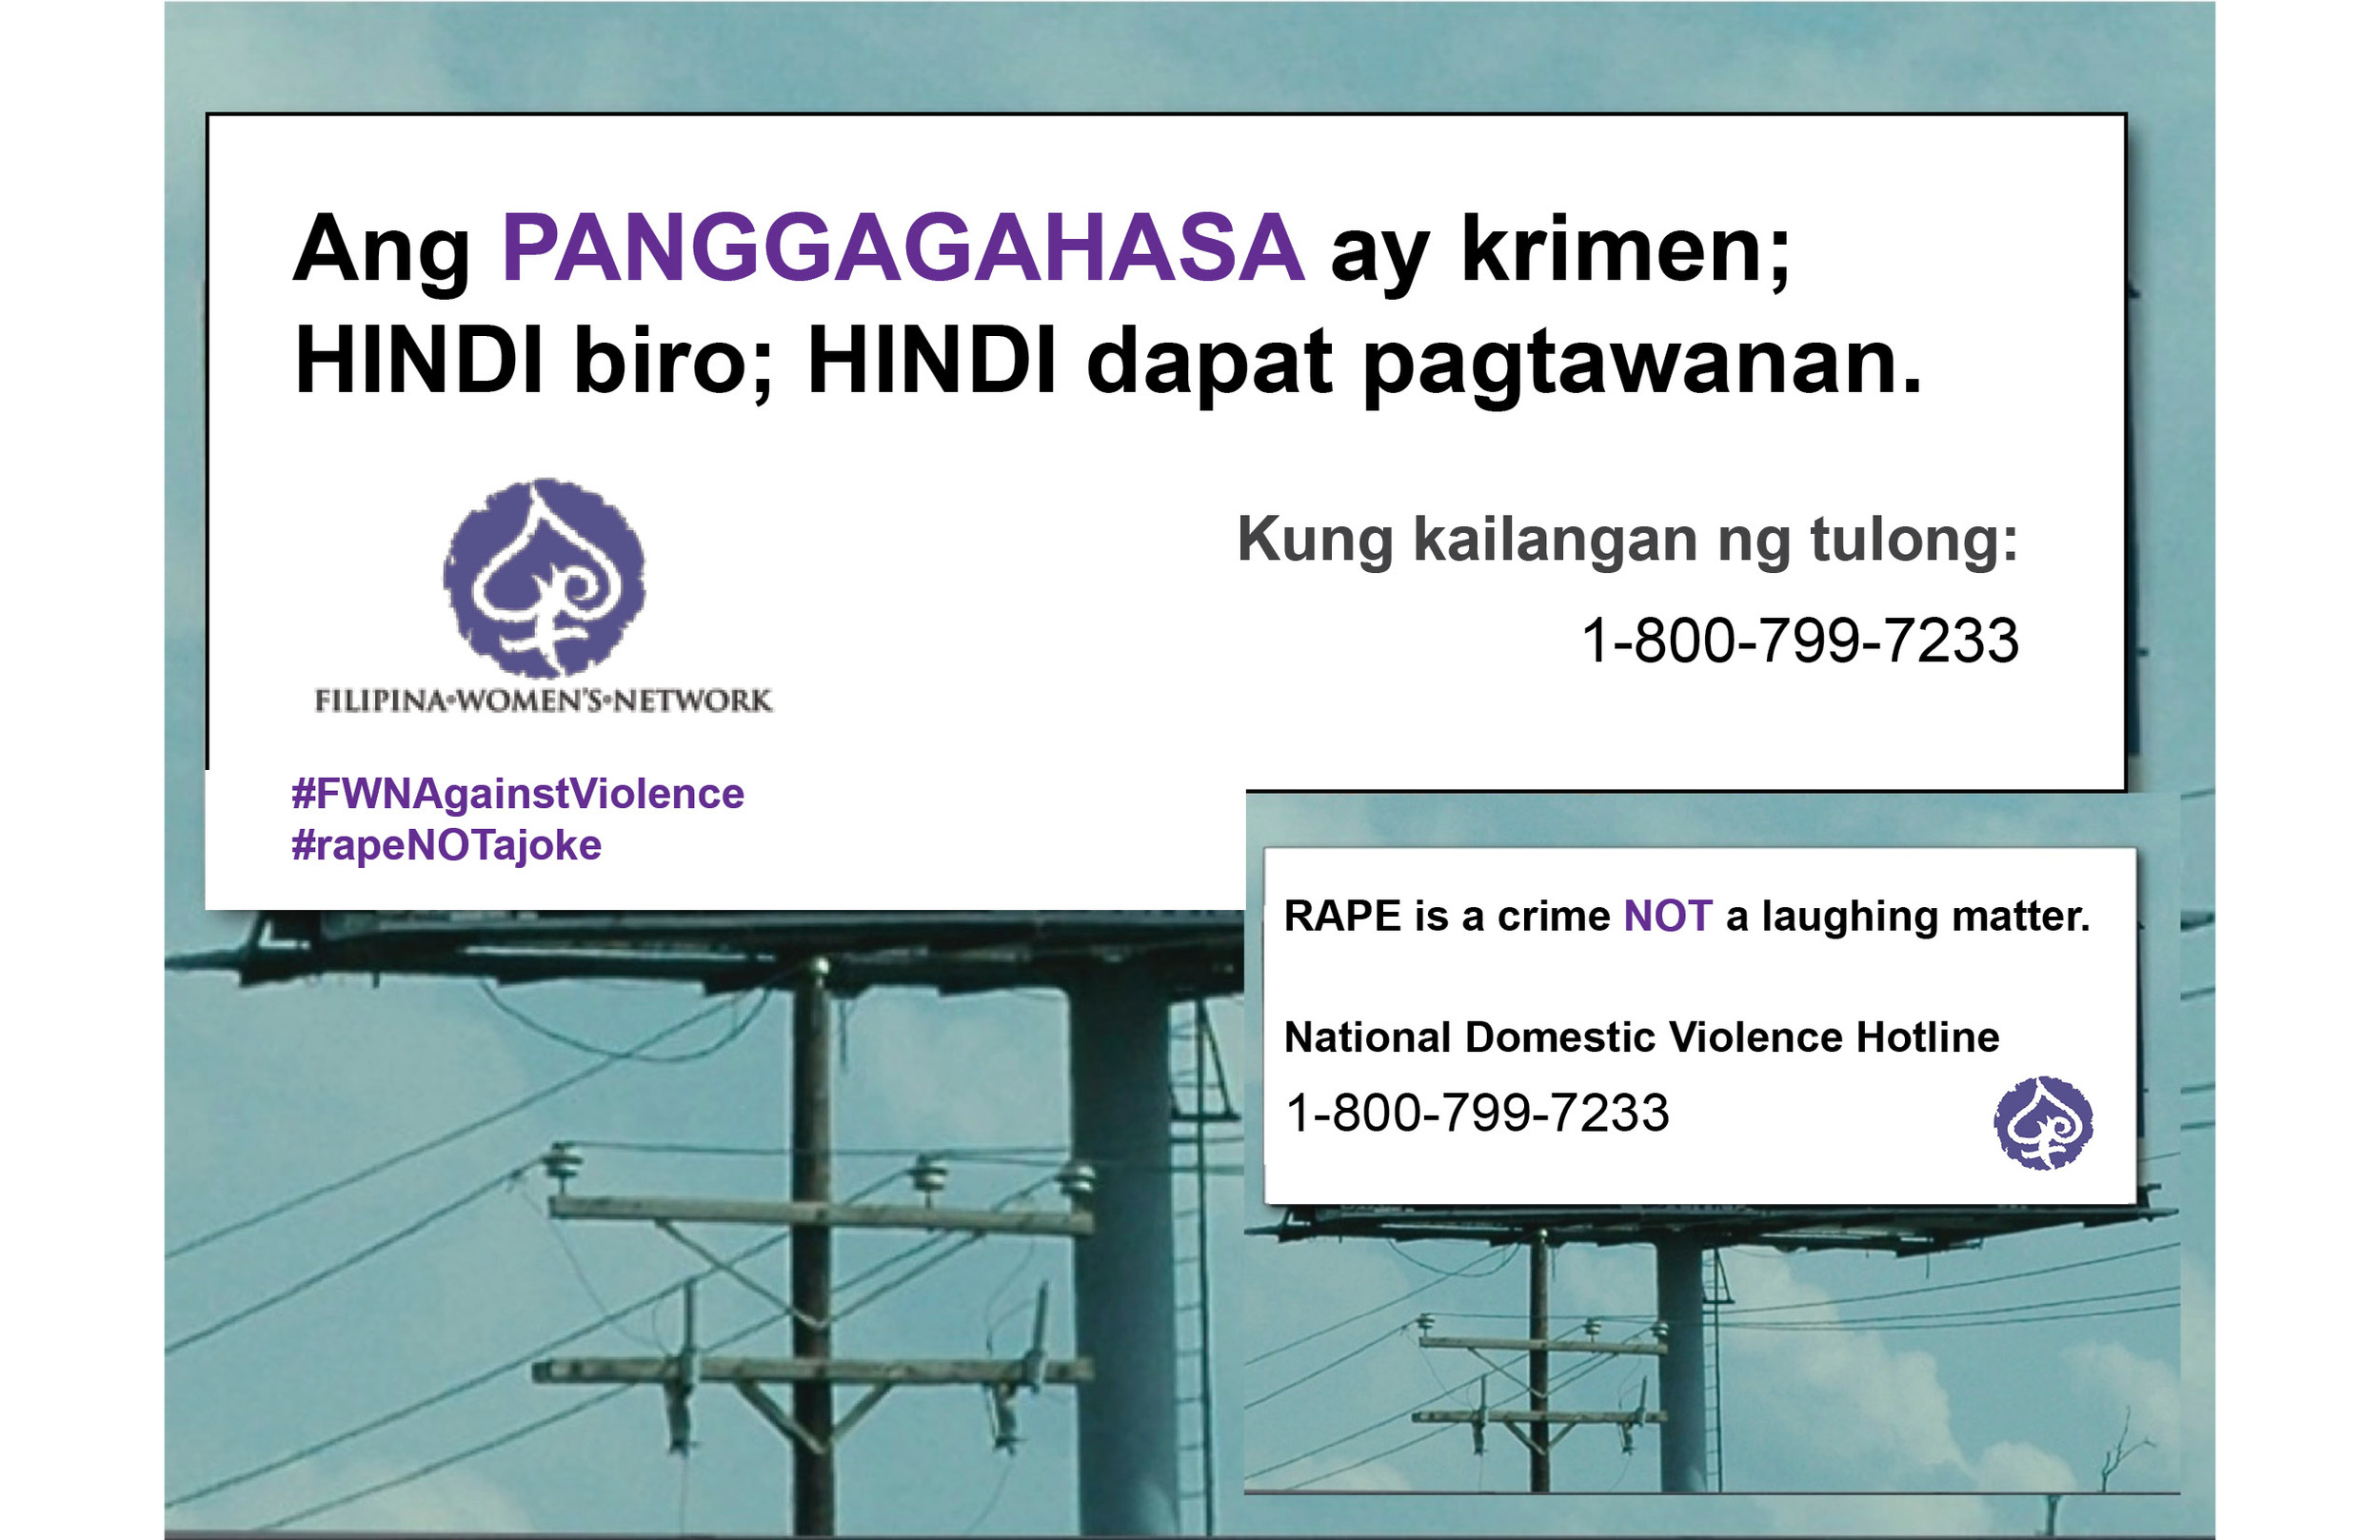 Tagalog billboard 2016